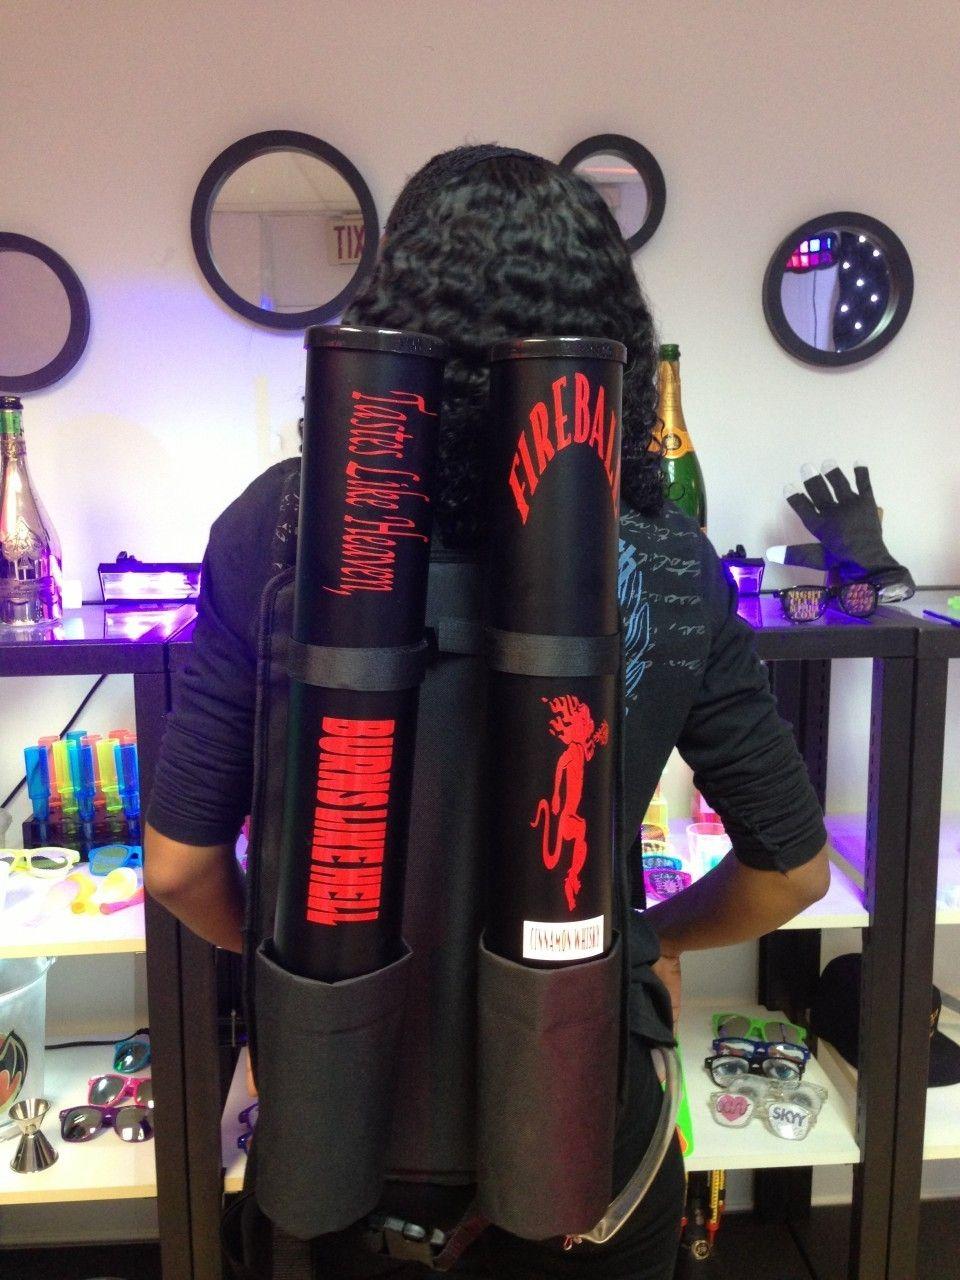 NightclubShop.com - DUAL SHOT DISPENSER BACKPACK, $129.99 (http://www.nightclubshop.com/dual-shot-dispenser-backpack/)